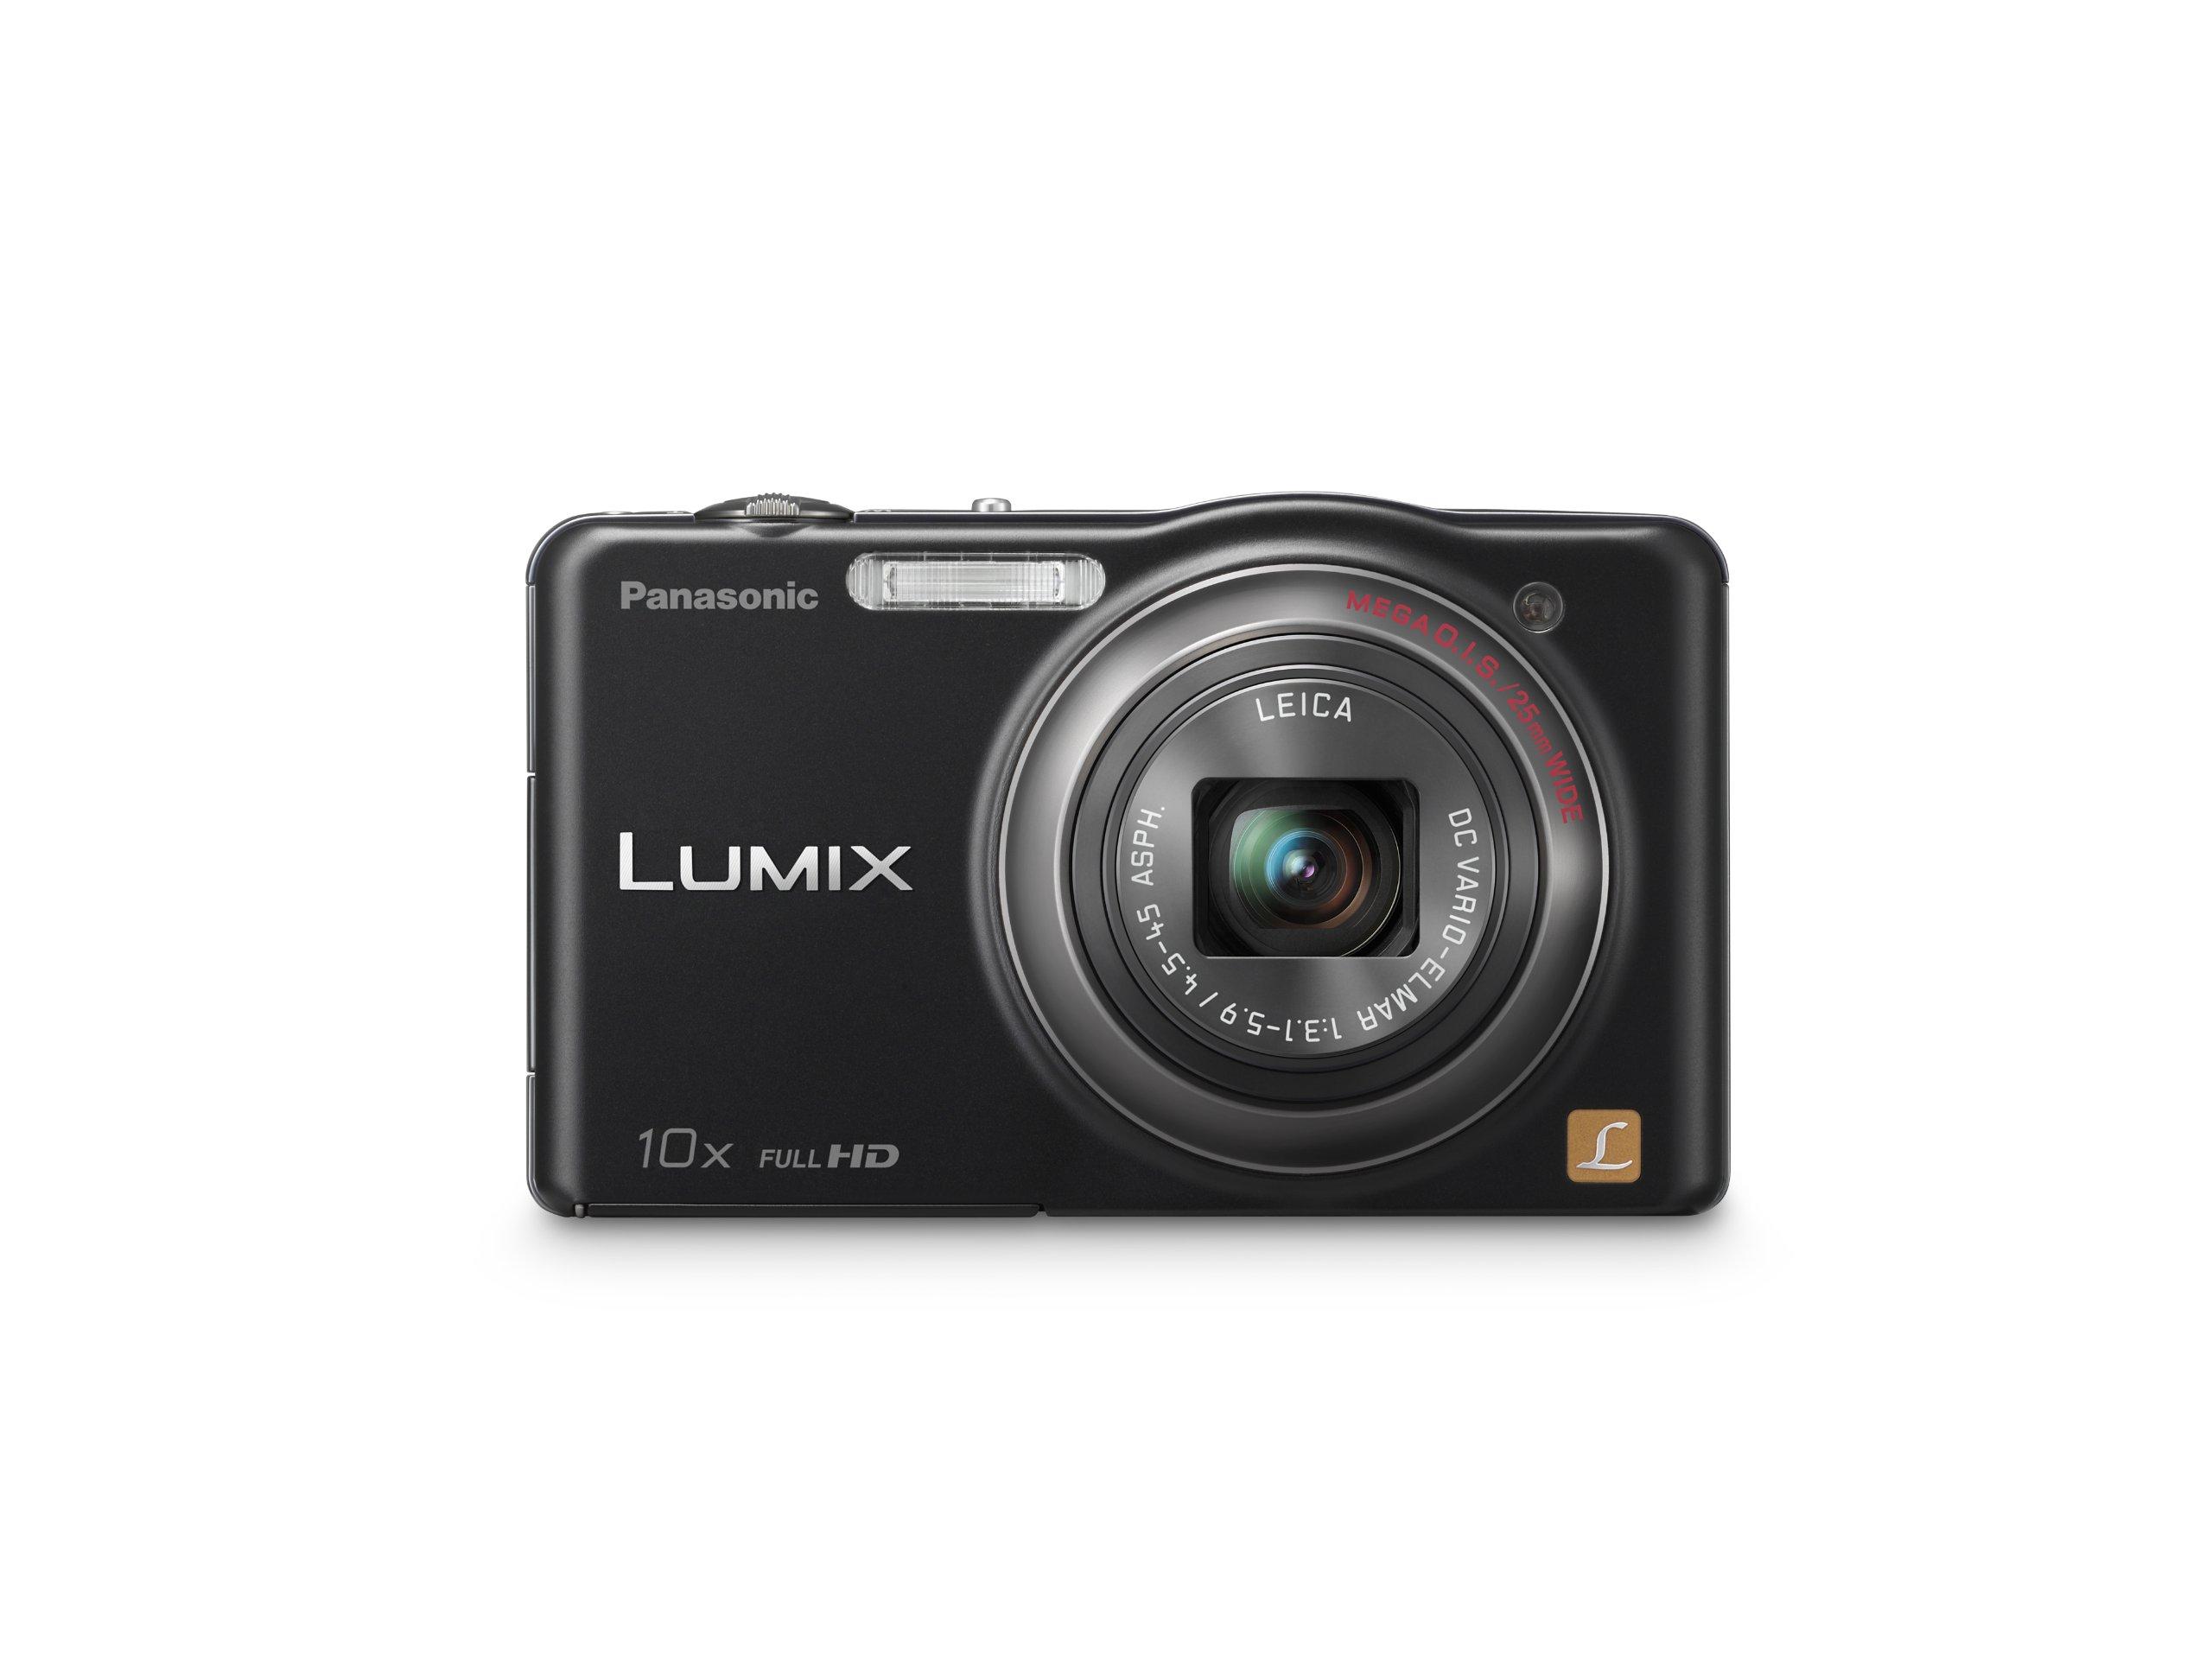 Panasonic Lumix SZ7 14.1 MP High Sensitivity MOS Digital Camera with 10x Optical Zoom (Black)